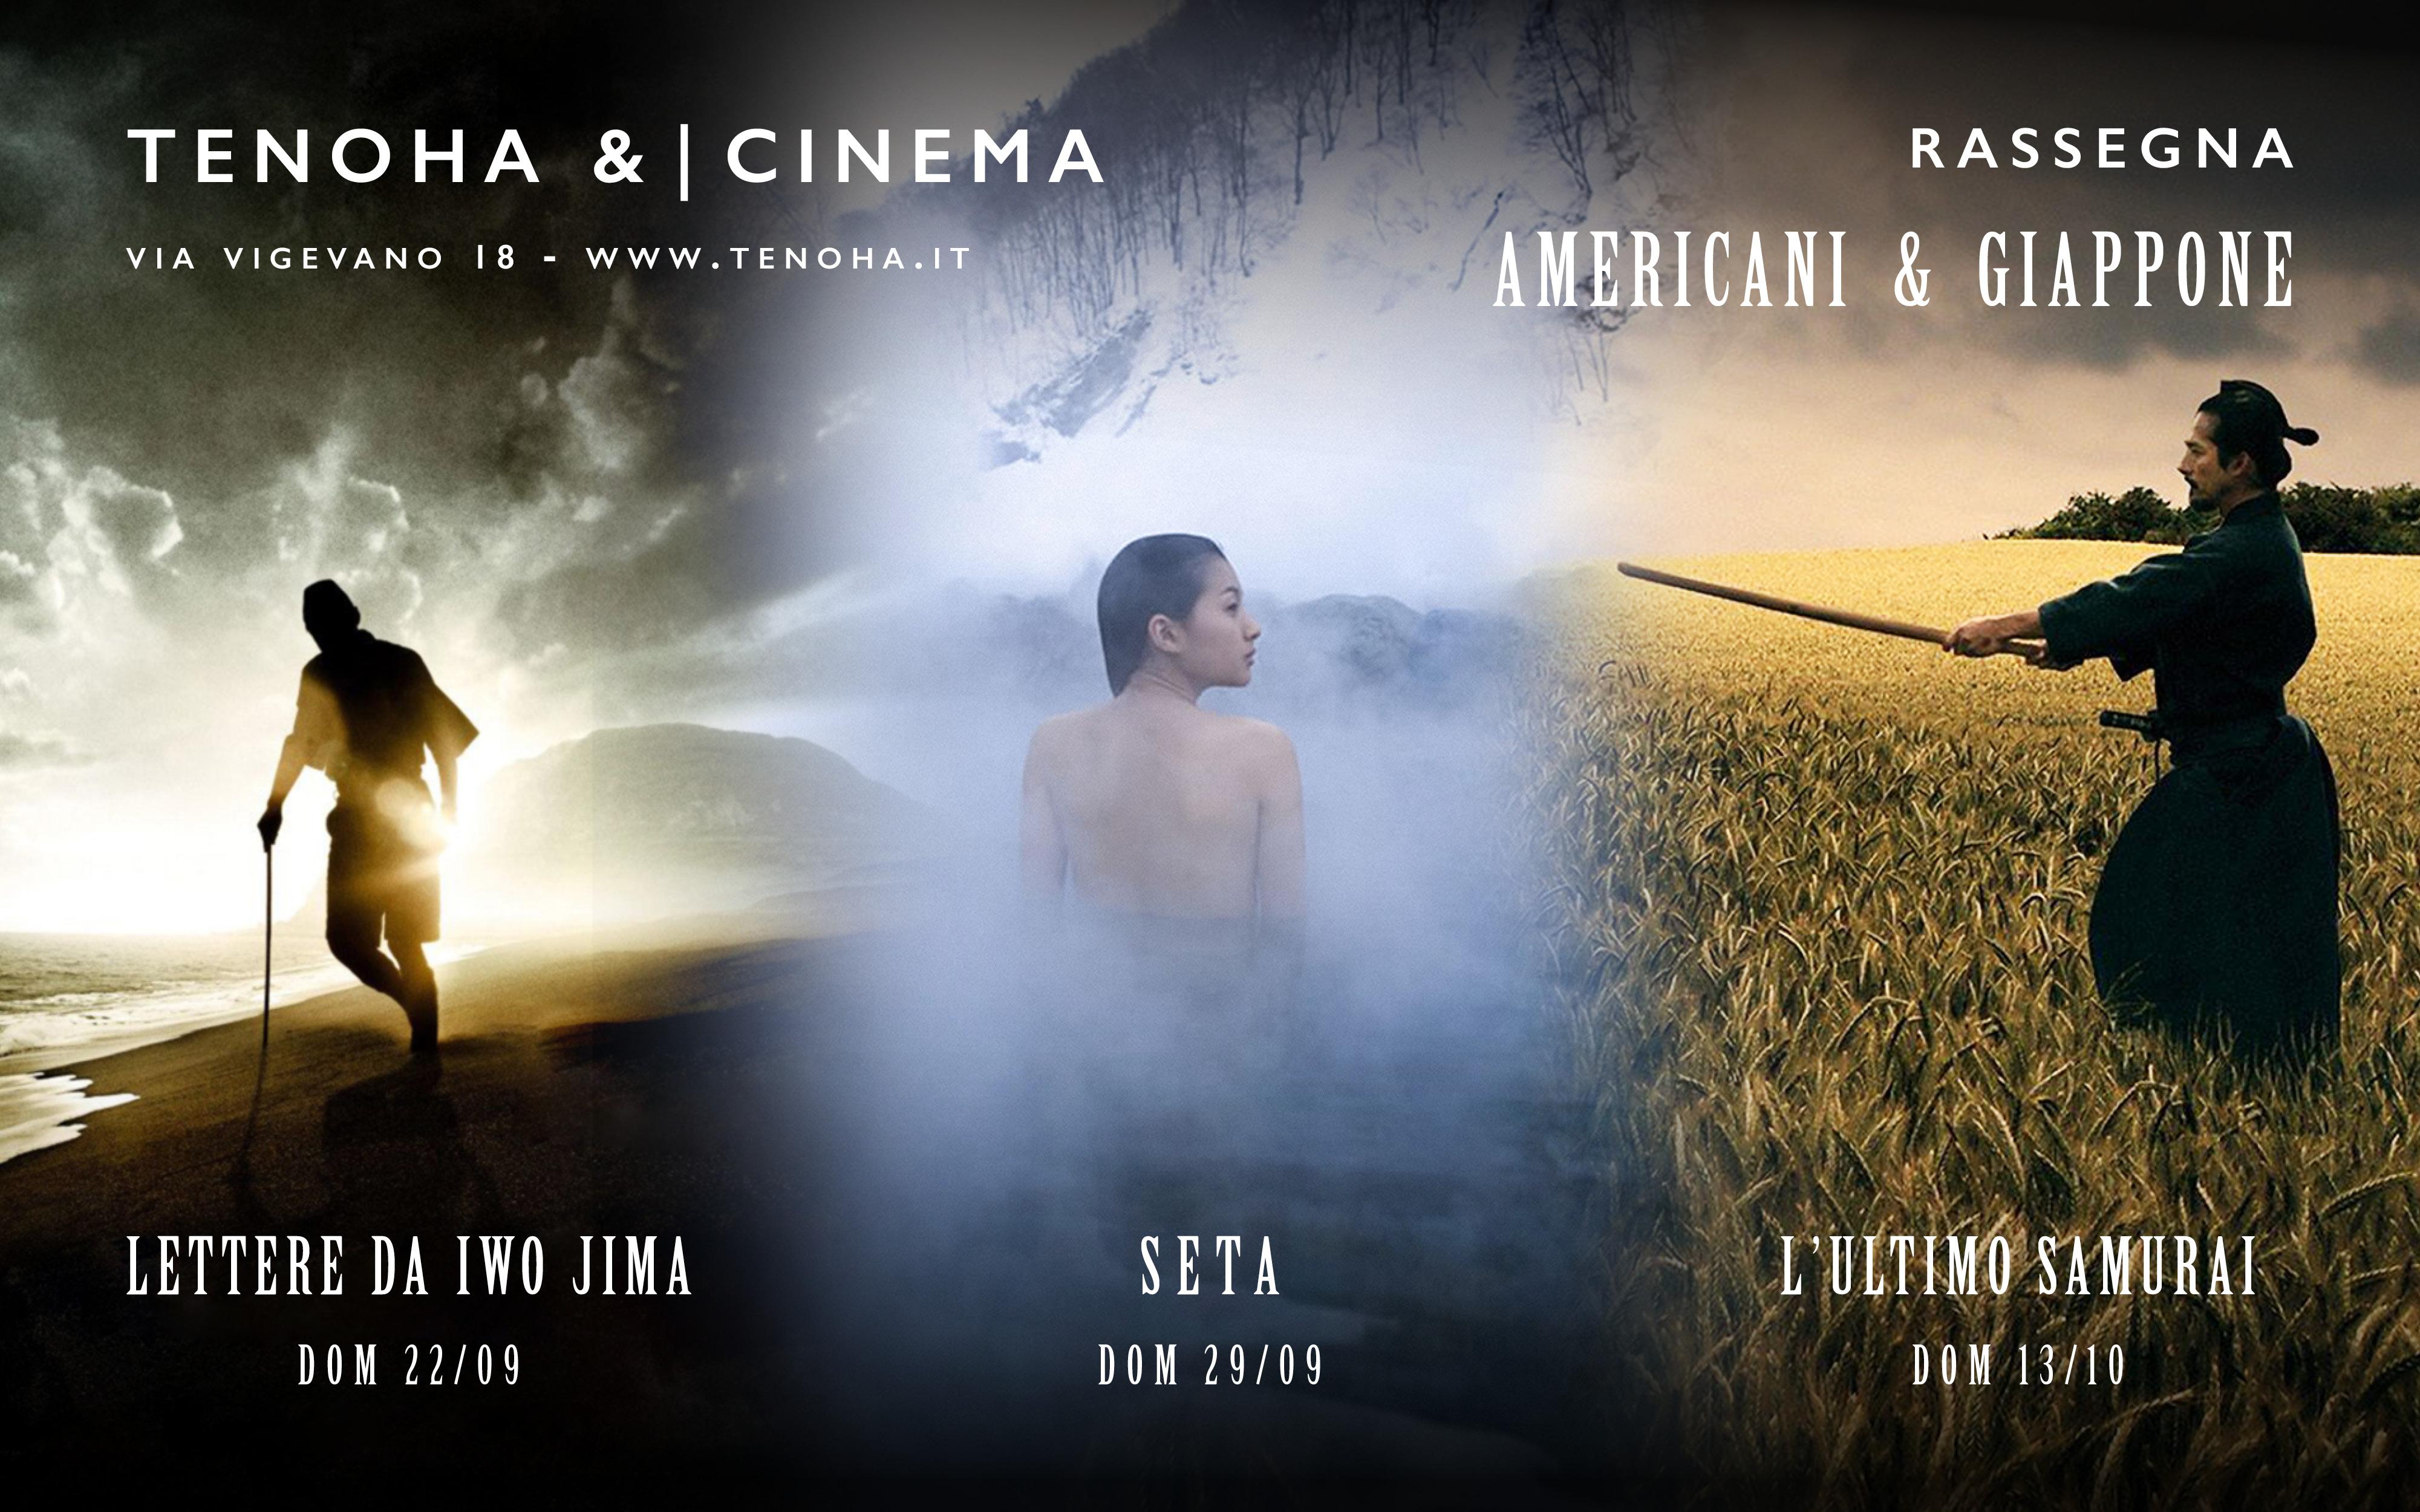 tenoha cinema